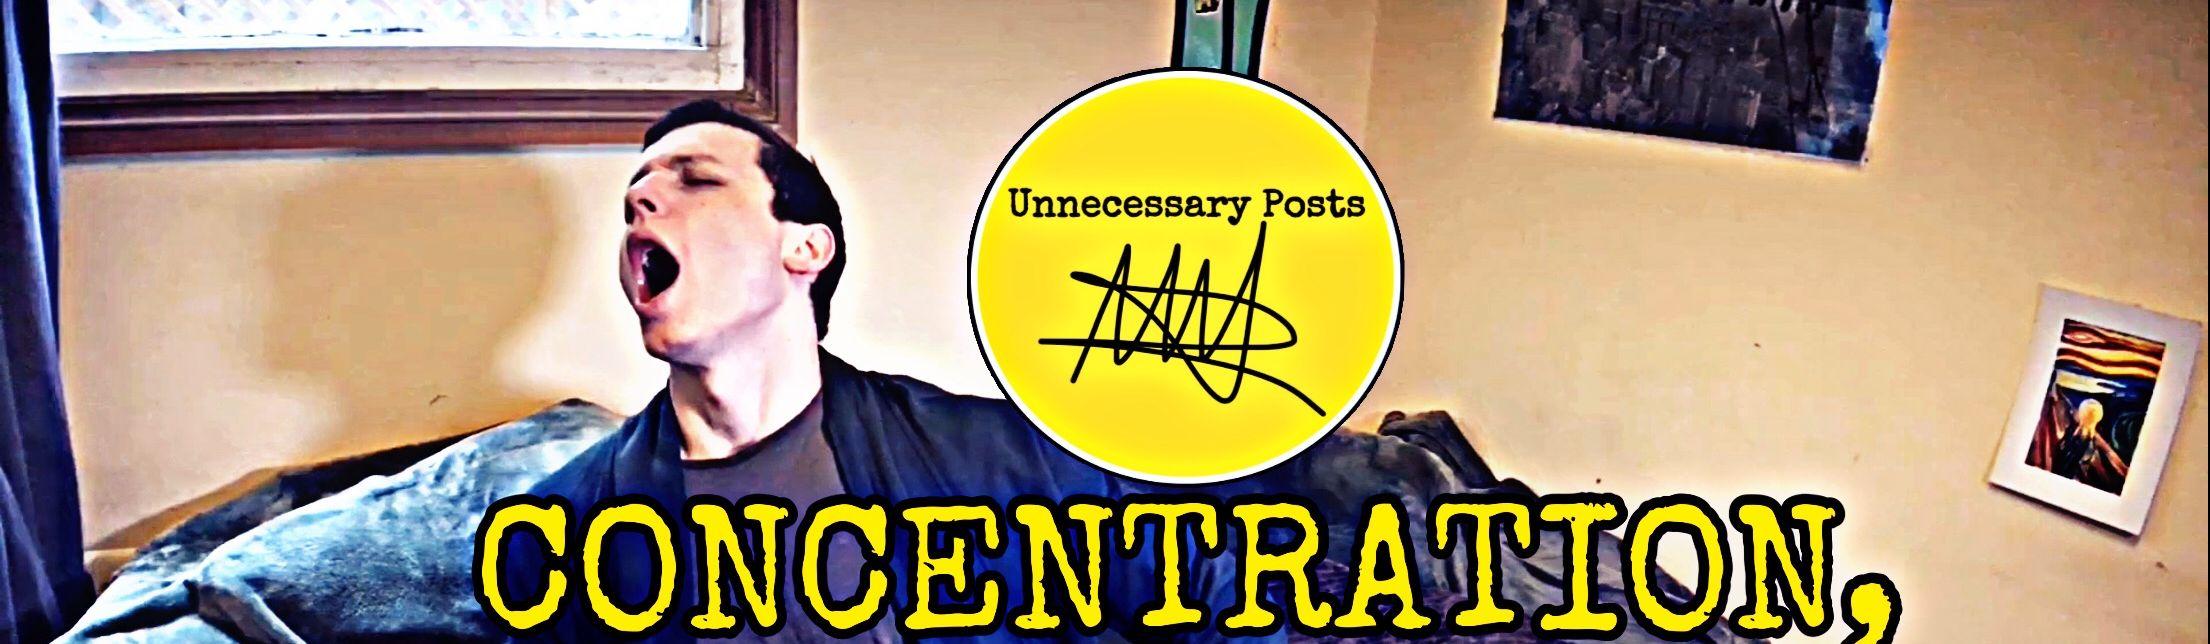 Unnecessary Posts